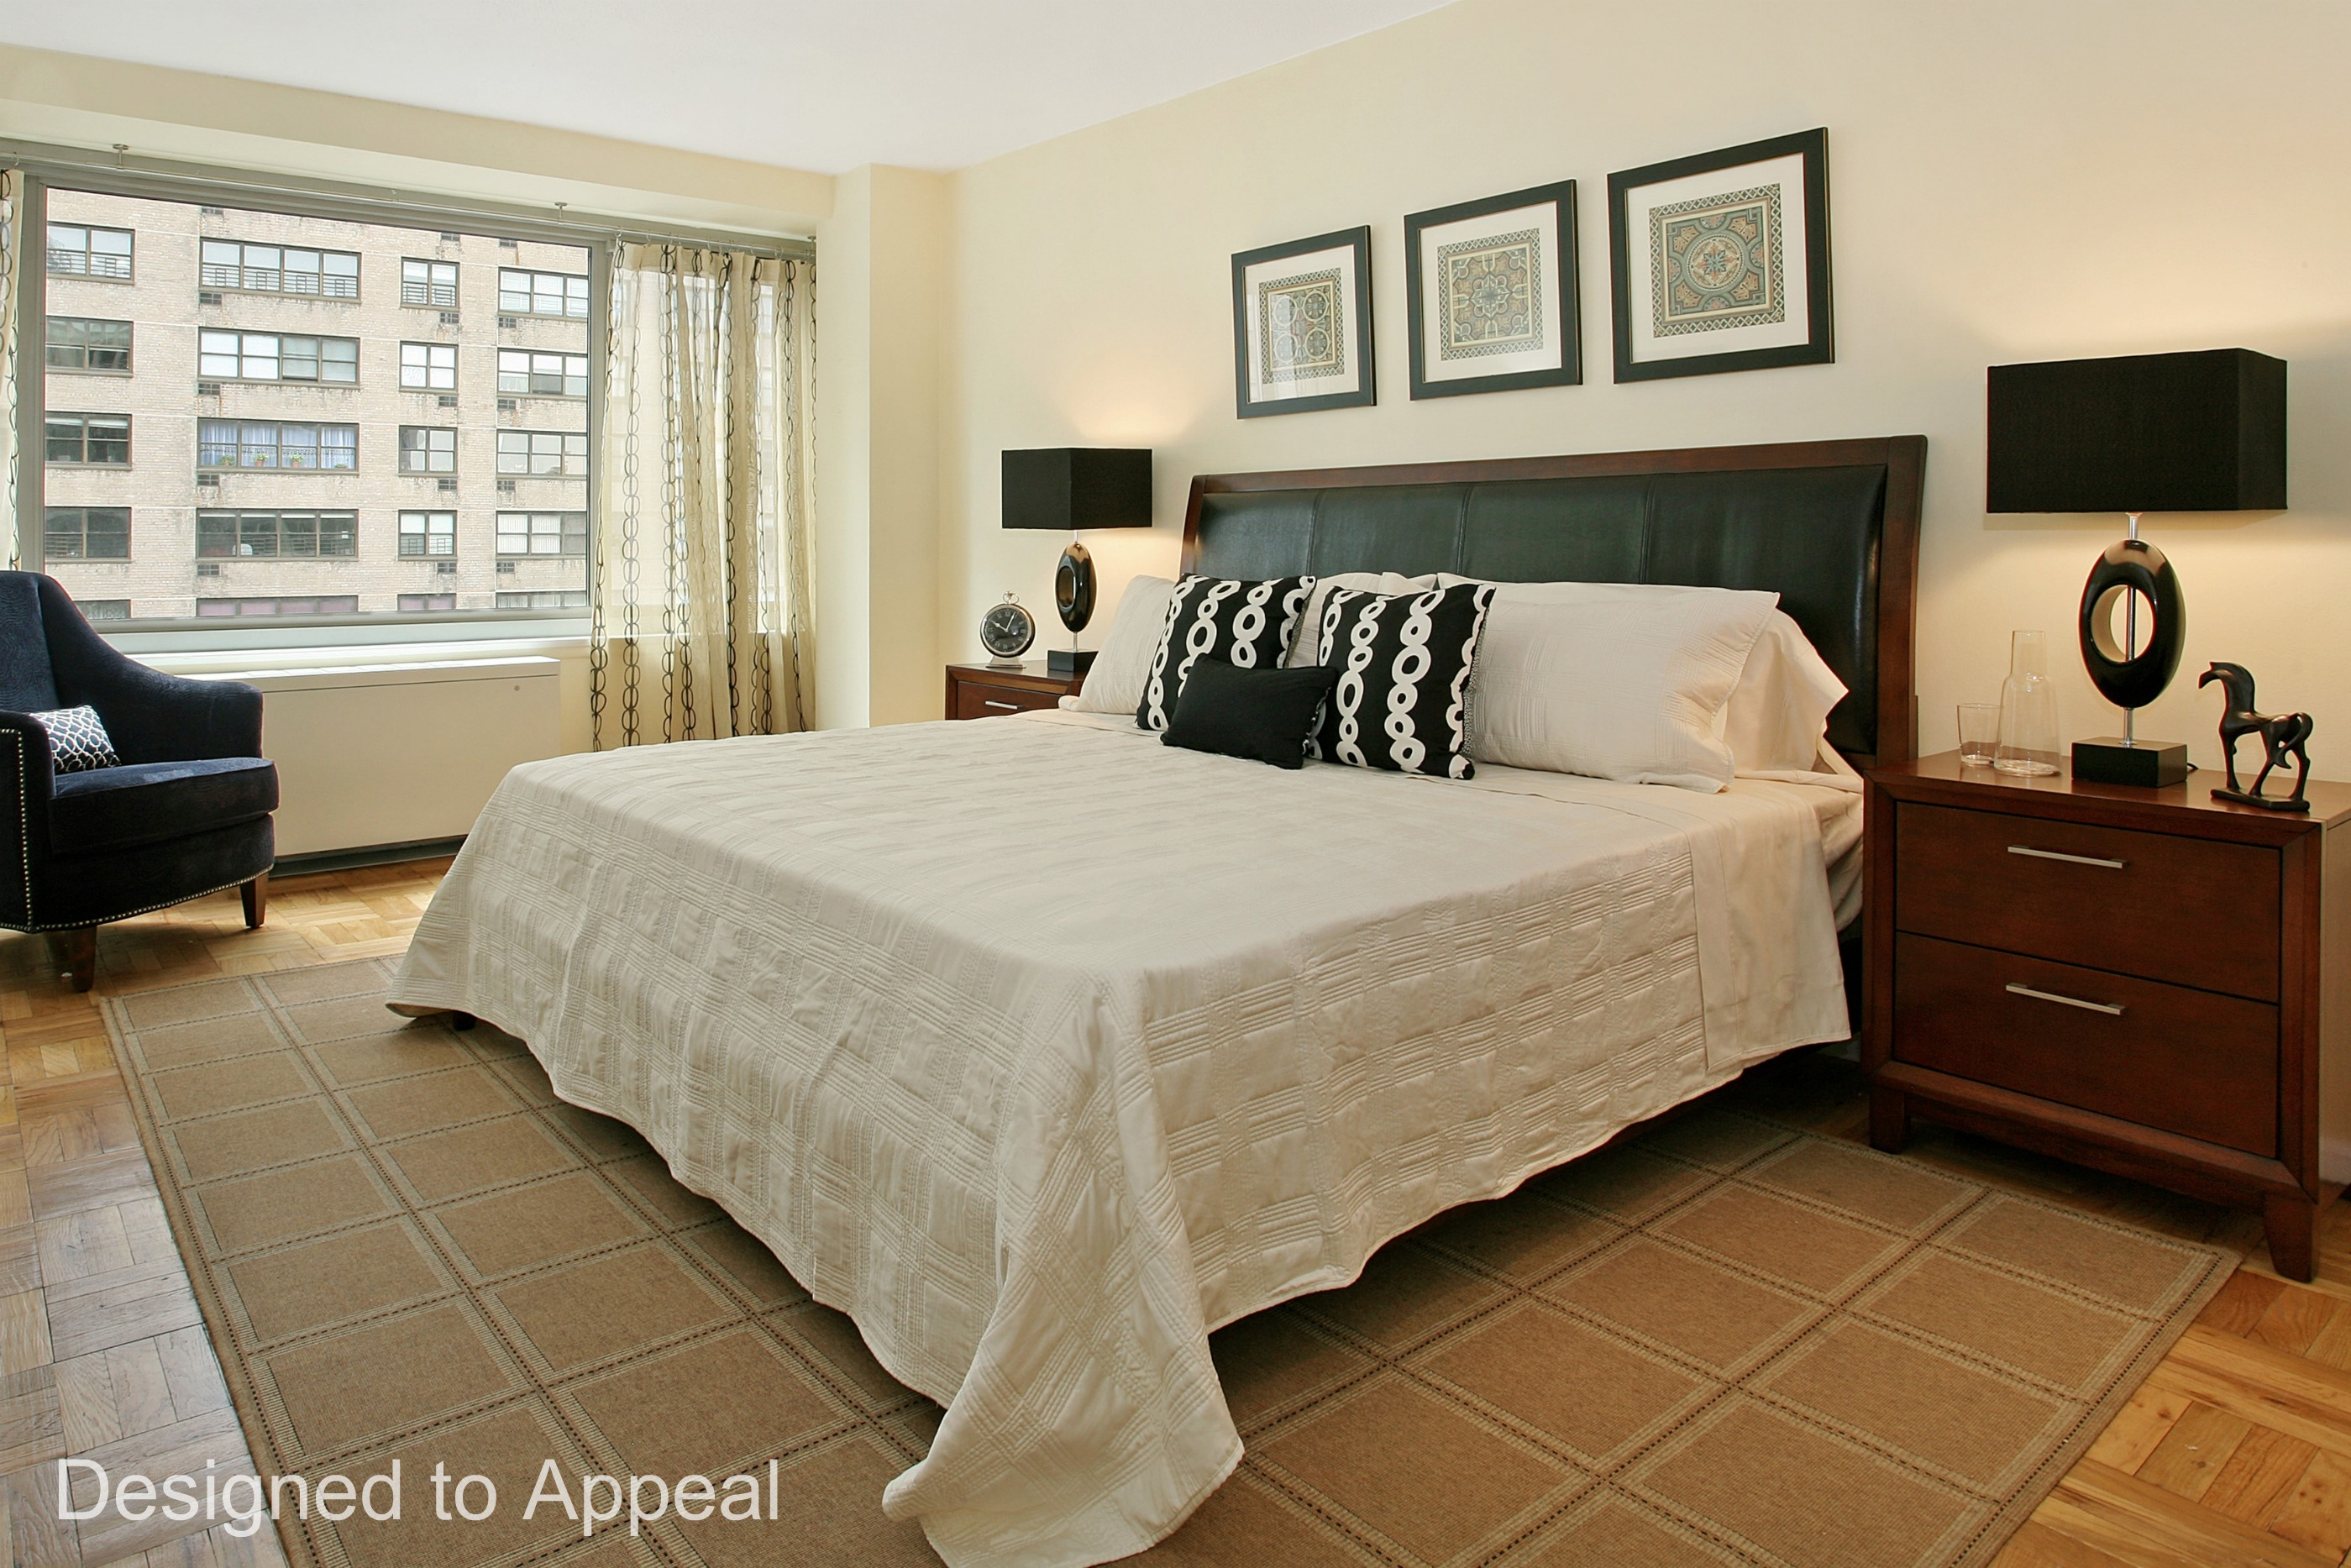 Bedroom Rug Placement